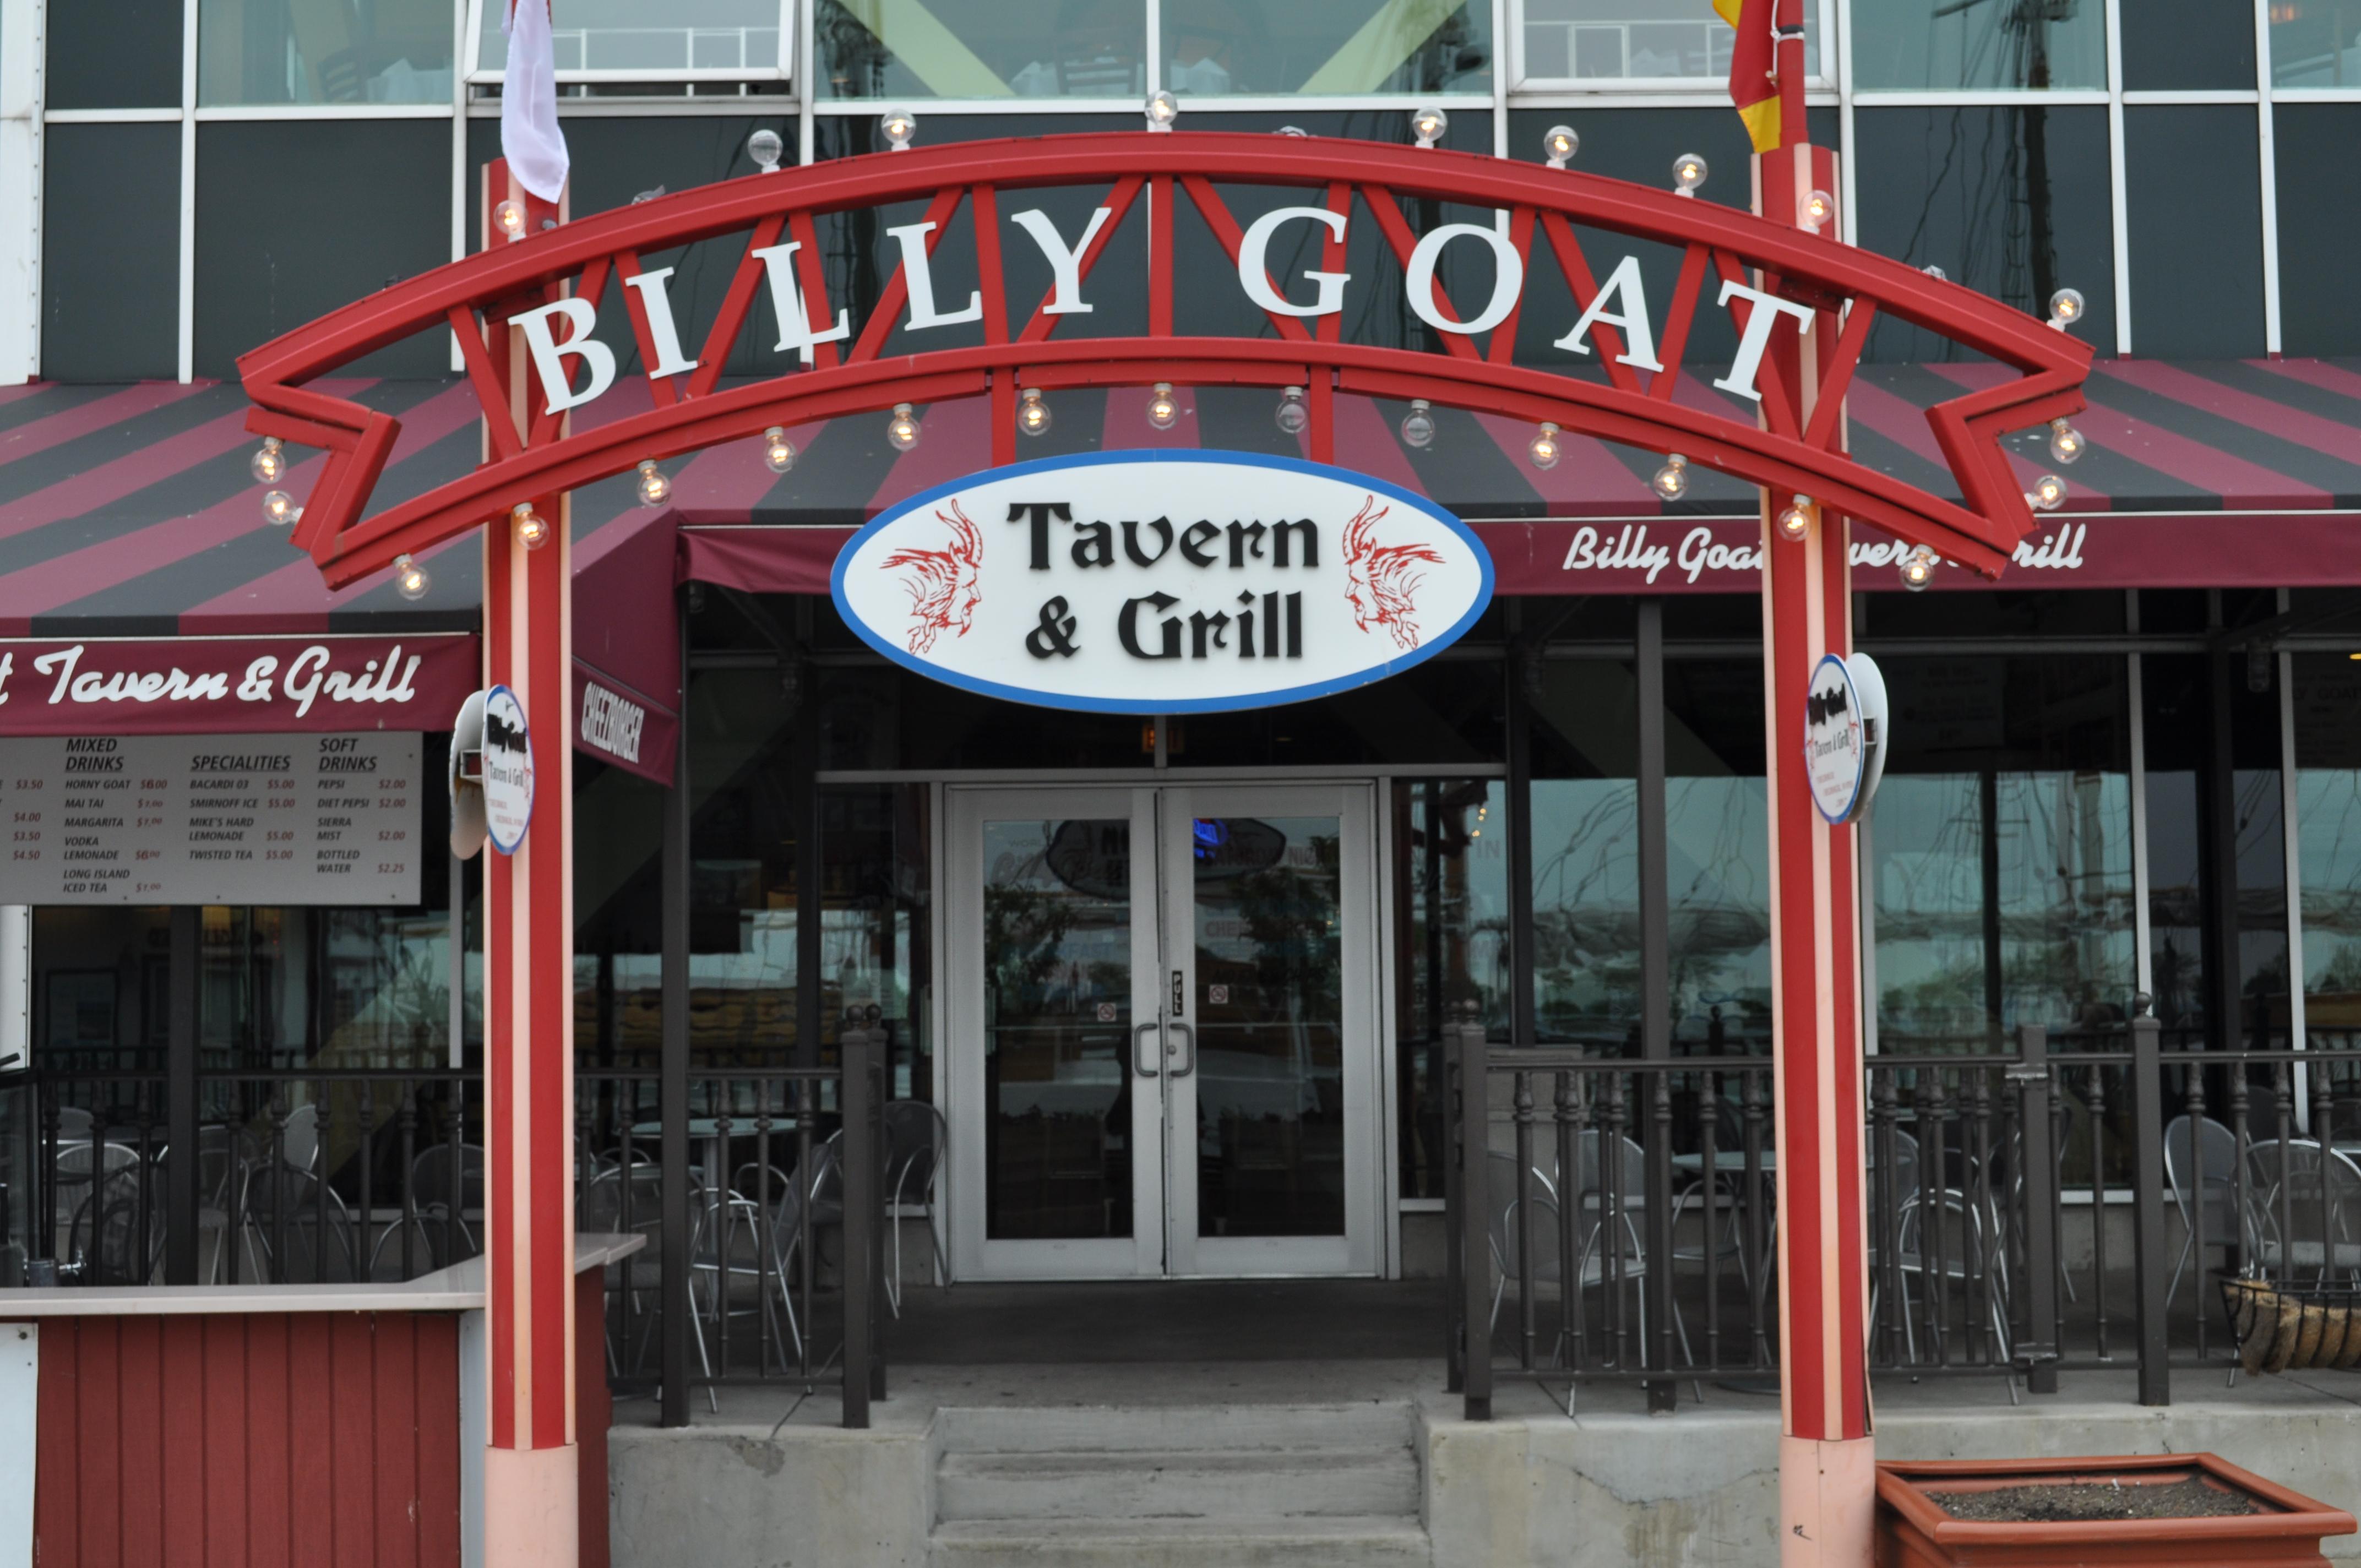 Bg navy pier 03 the world famous billy goat tavern - Chicago flower and garden show 2017 ...